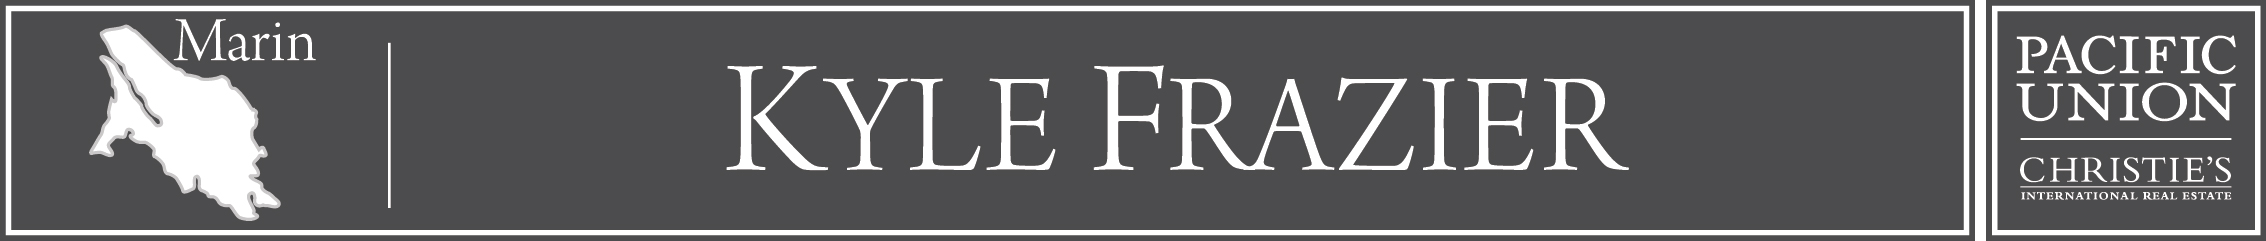 KyleFrazier_logo_rebrand-03